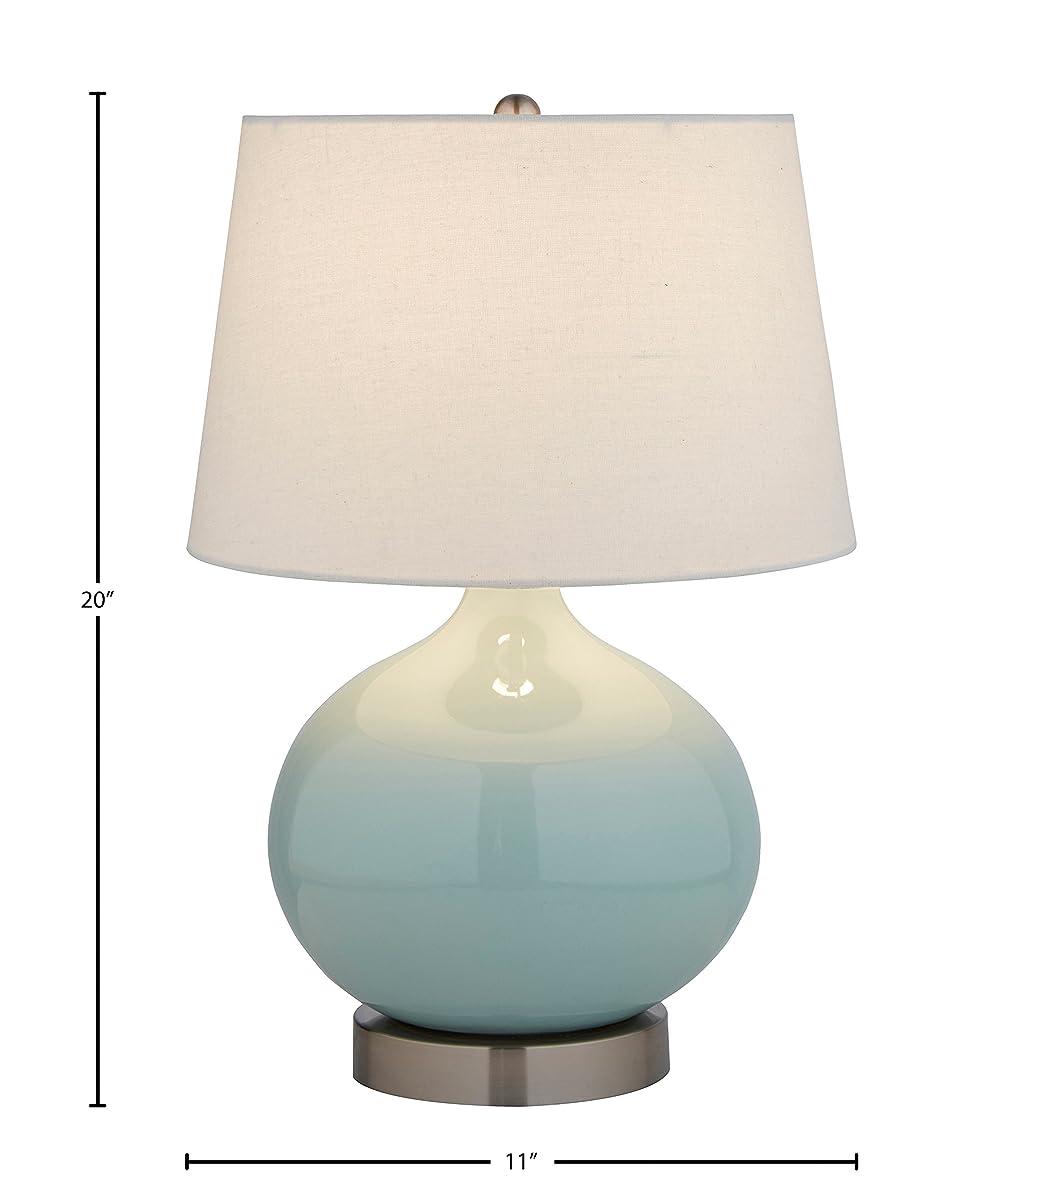 "Stone & Beam Cyan Ceramic Lamp, 20""H, With Bulb, White Shade"